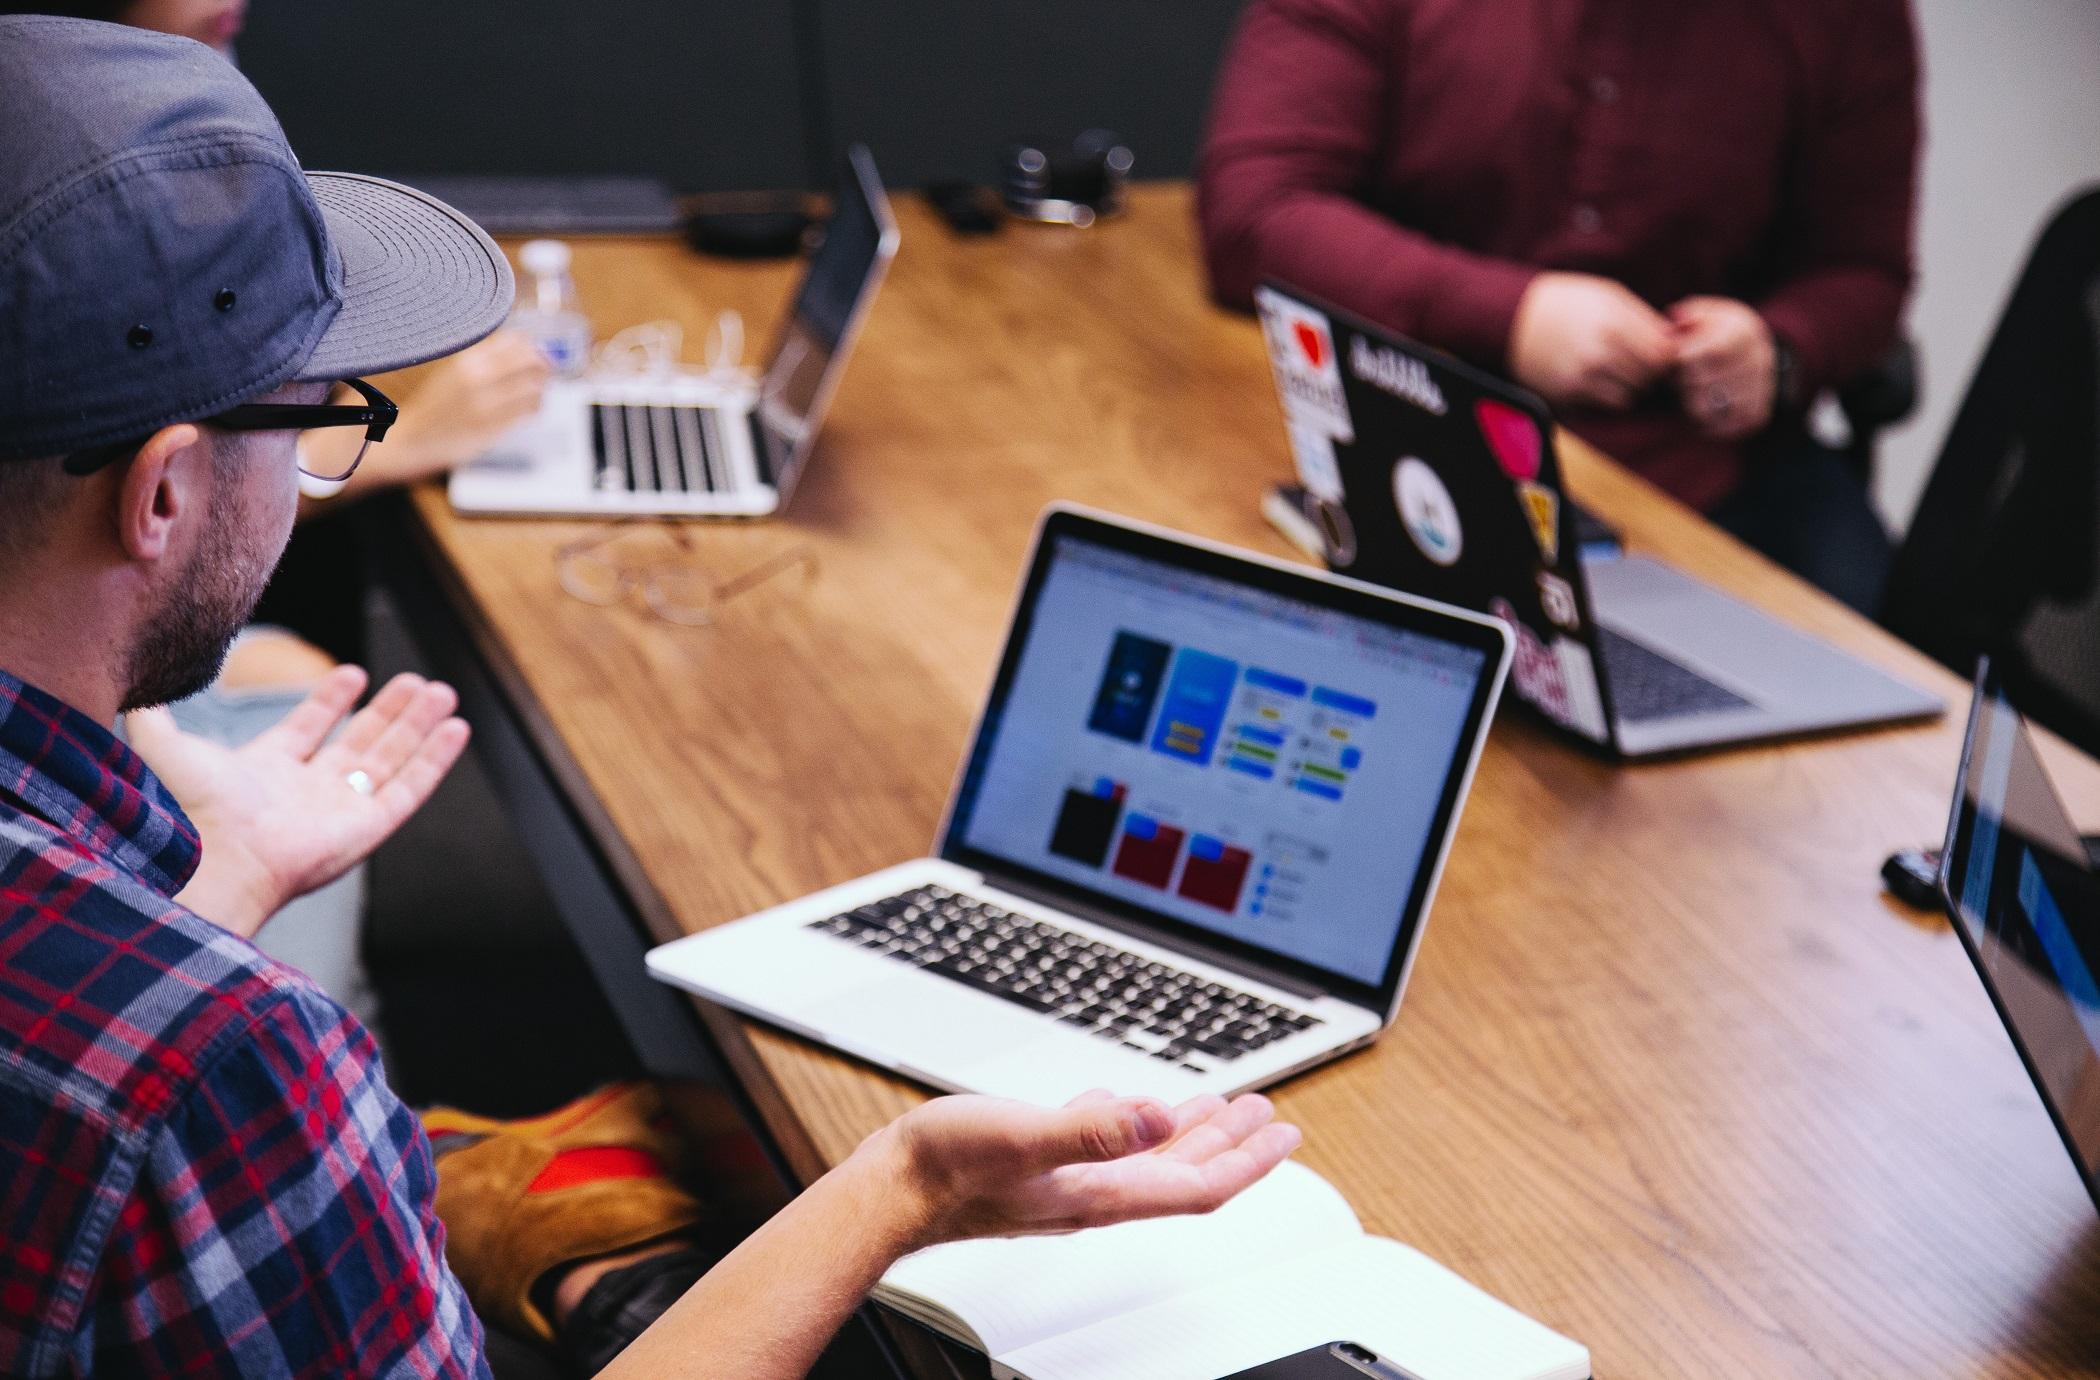 Entrepreneur First: Build Your Startup